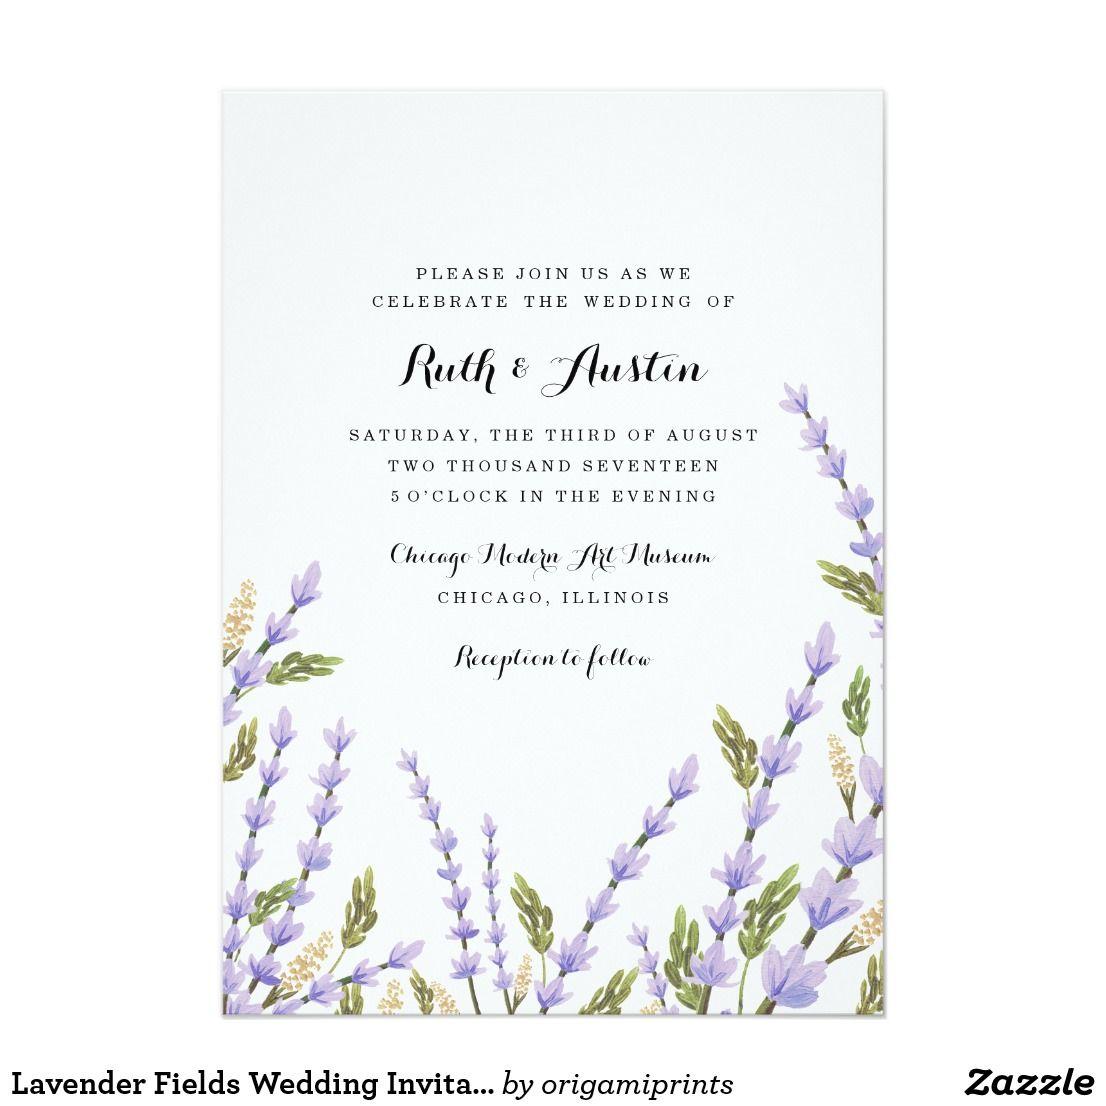 Lavender Fields Wedding Invitation | Weddings